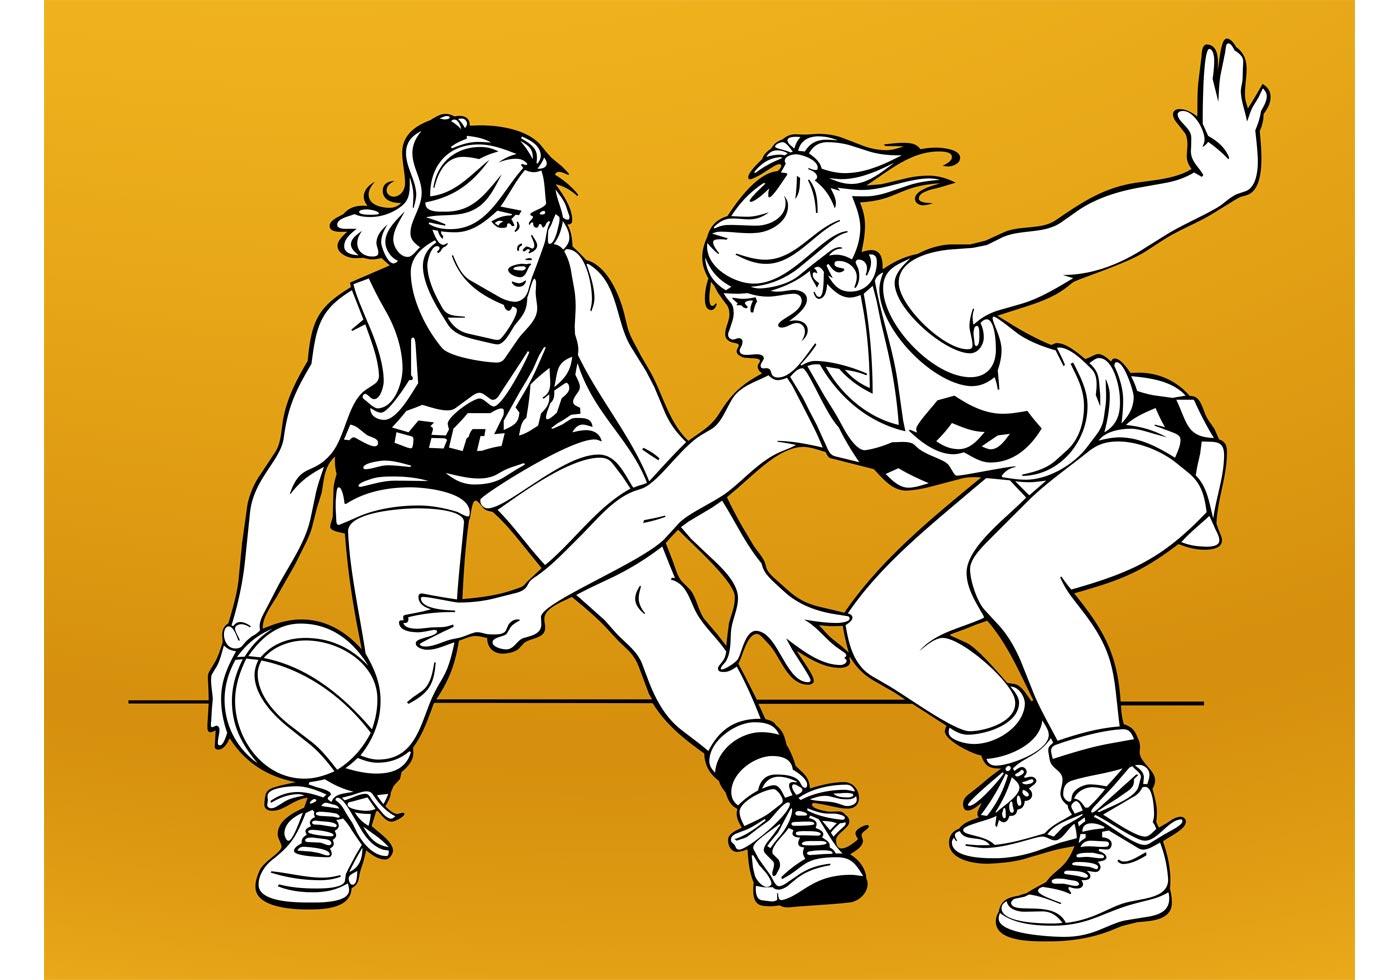 Баскетбол методика обучения ведения мяча ПЕДАГОГ ru Баскетбол методика обучения ведения мяча